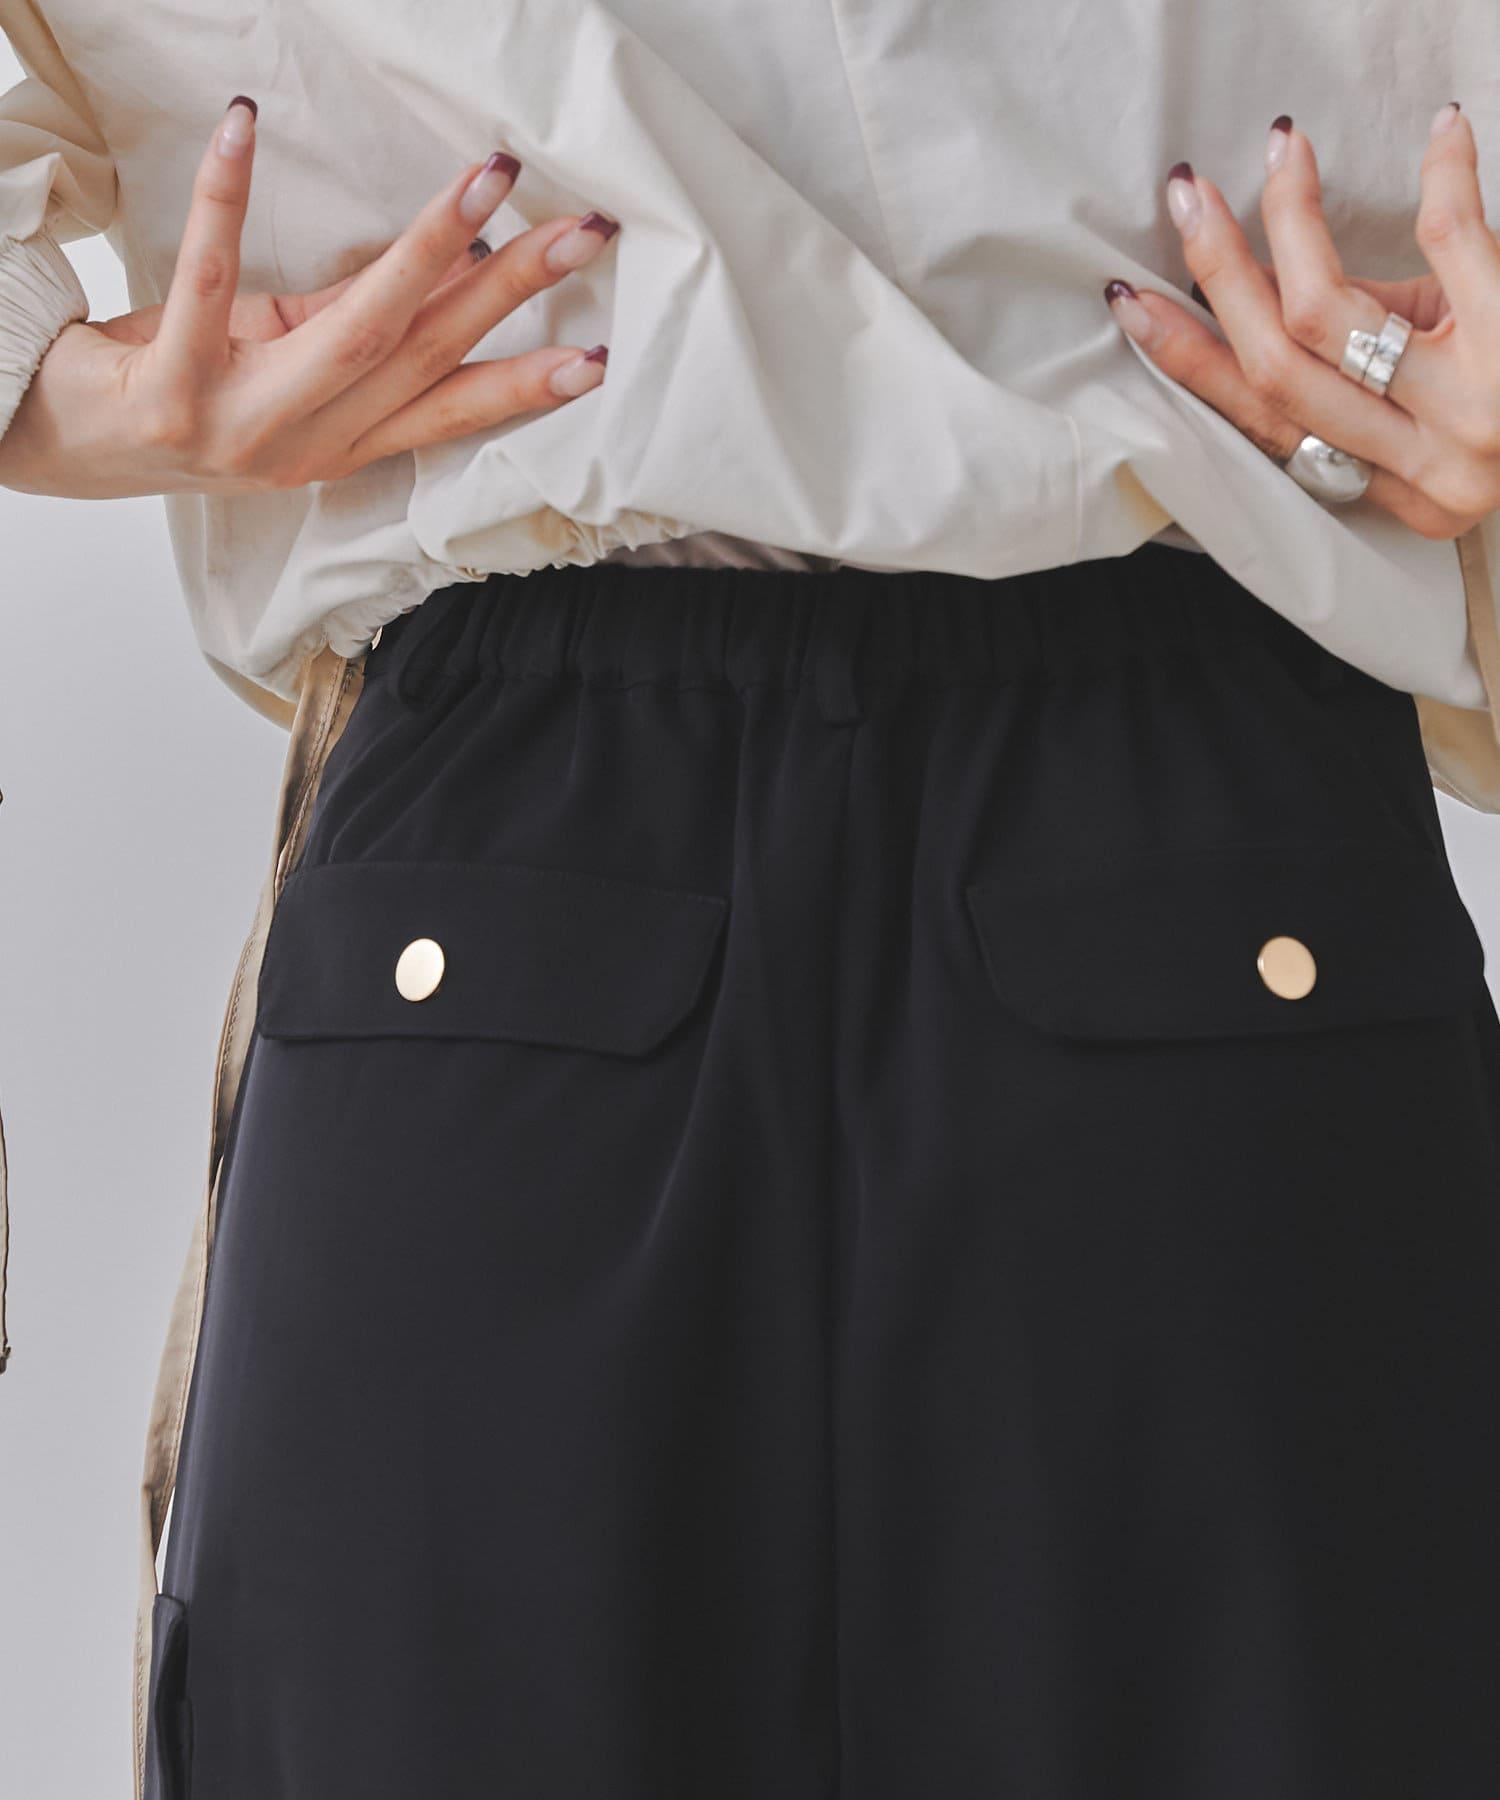 mona Belinda(モナ ベリンダ) 裾絞り2WAYワークパンツ